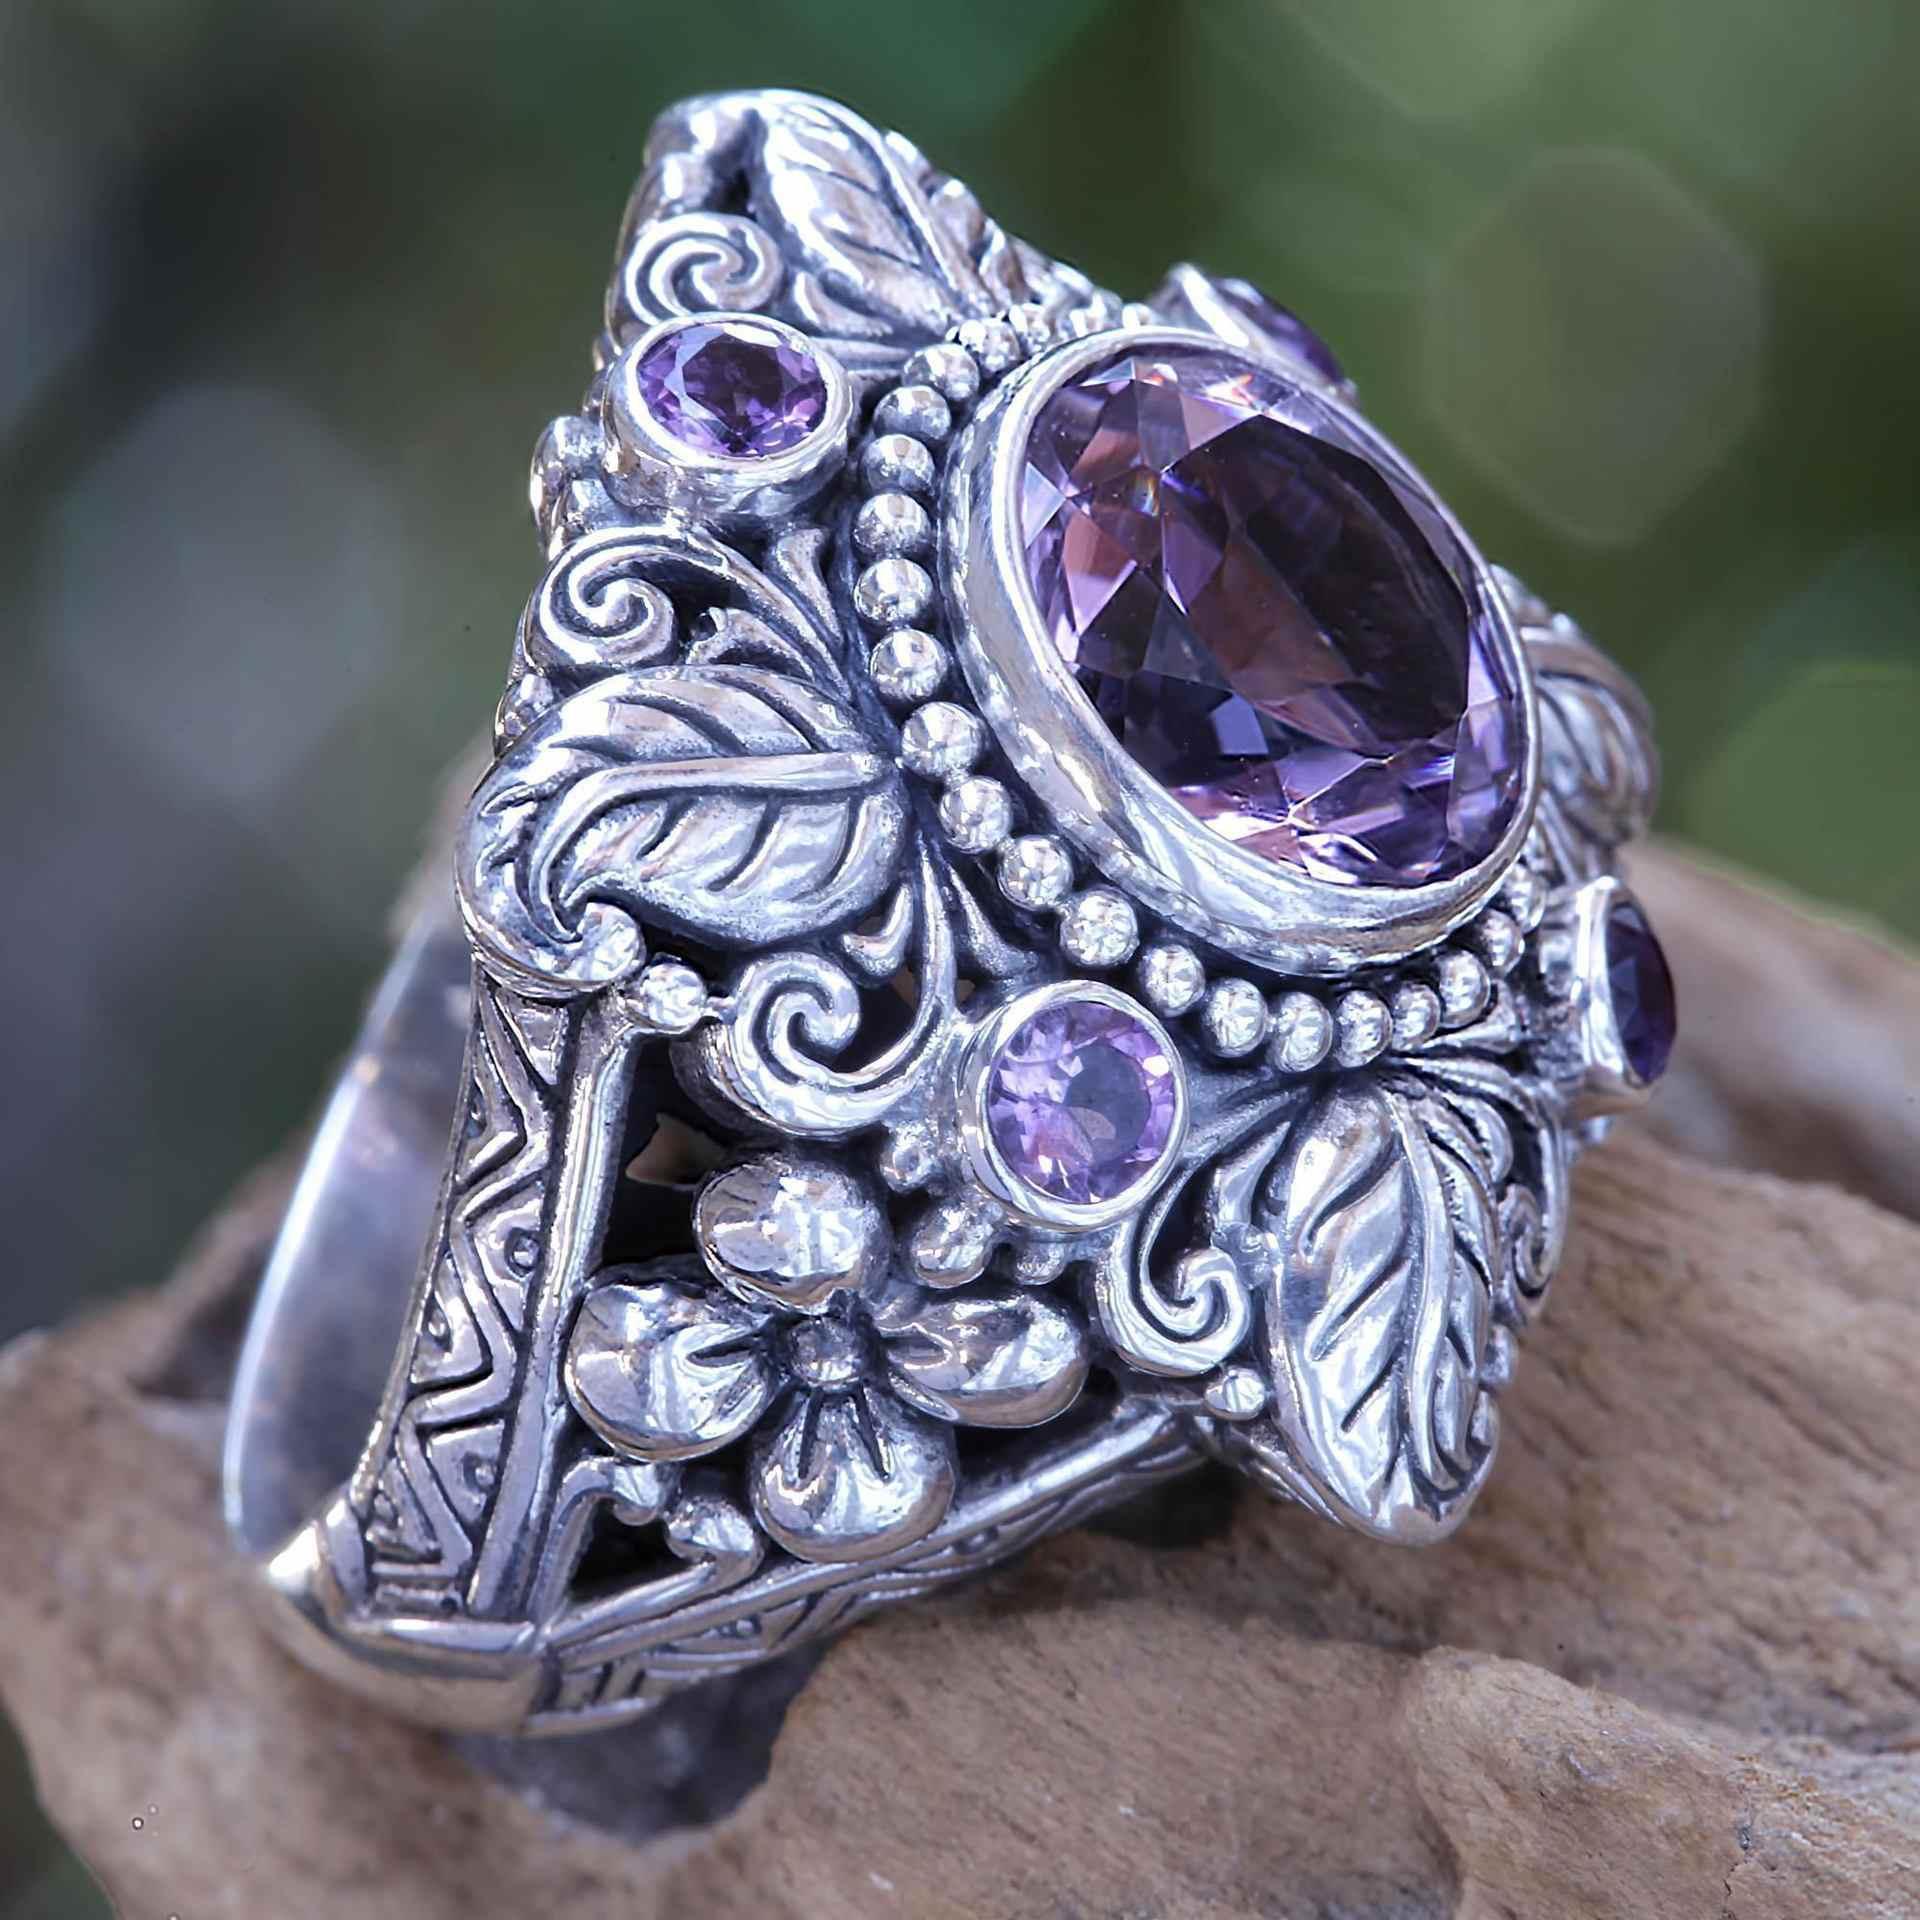 925 anillos เงินไทยเงินสีดอกไม้รูปคริสตัลแหวนผู้หญิงสีม่วง Cz amethyst แหวน